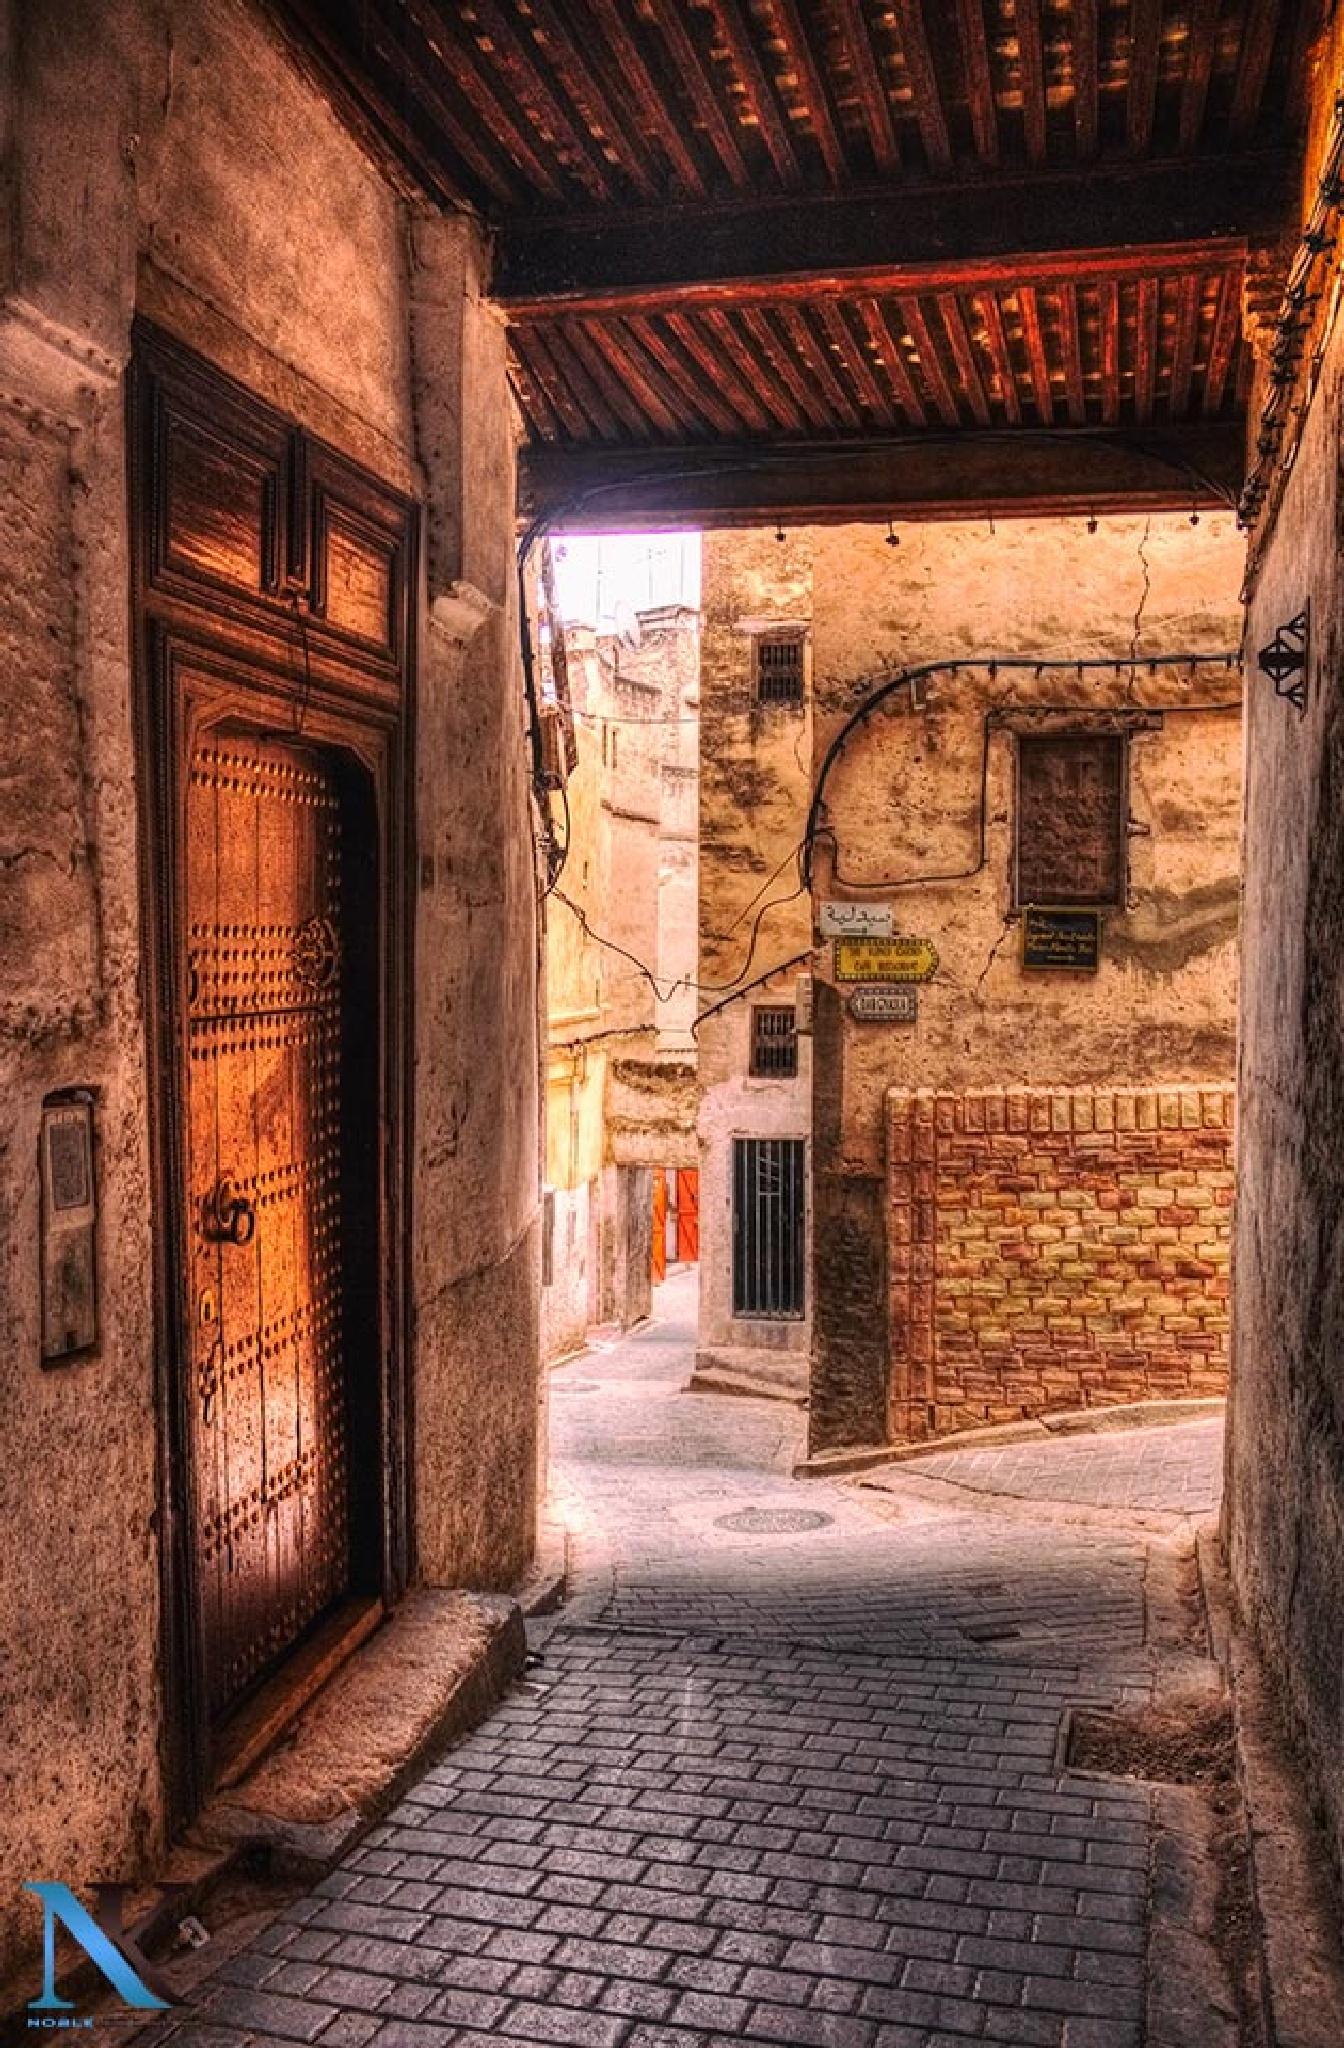 Old derb in old Medina fes : the 12 Centuries city  by Najib Khayati